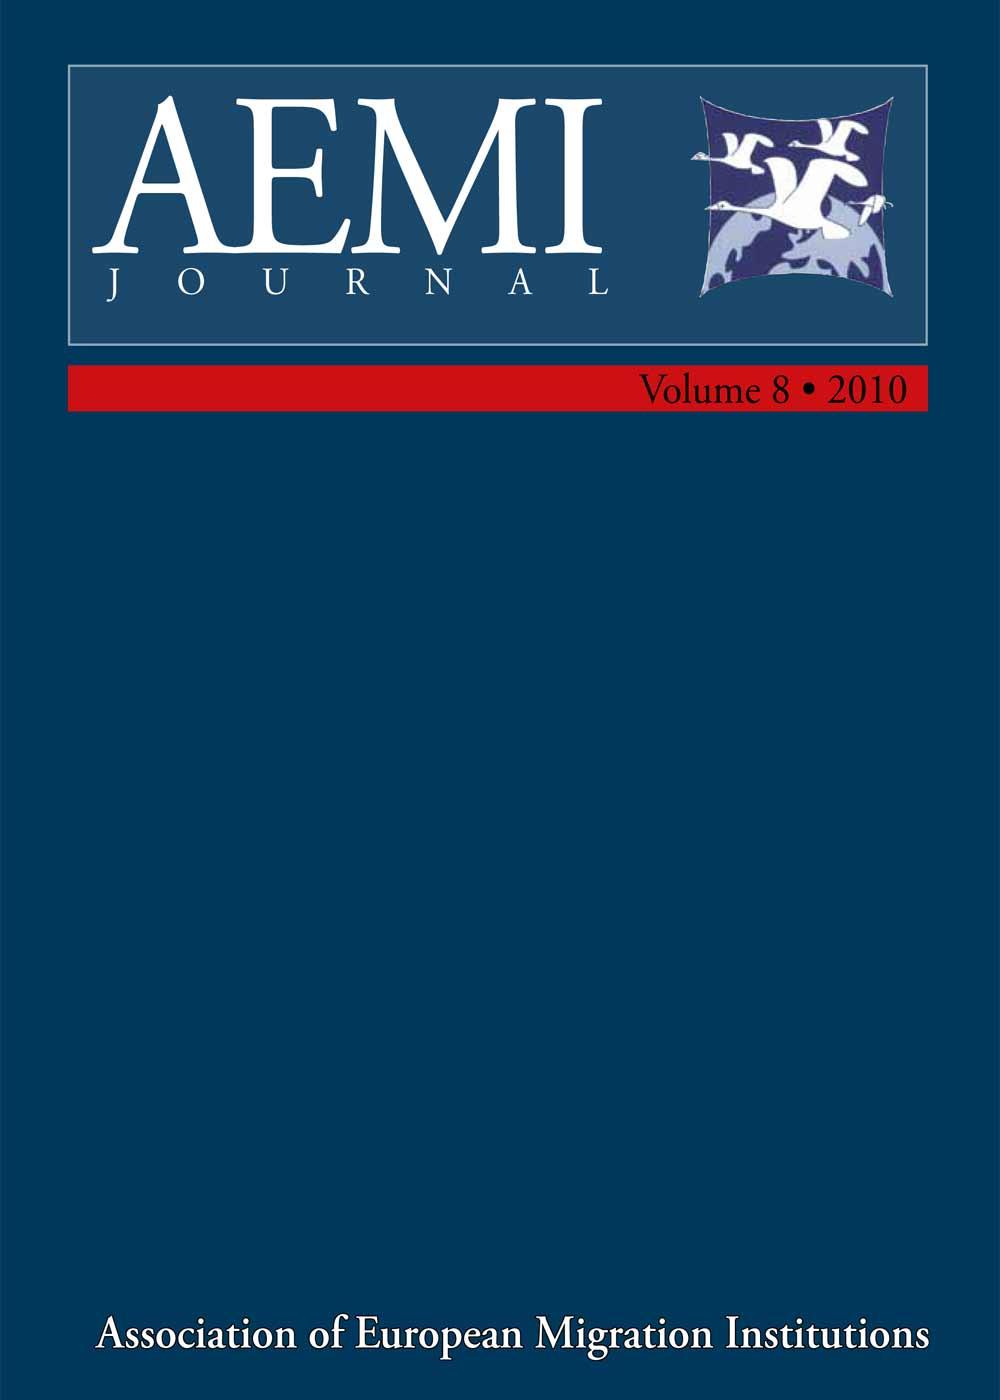 AEMI Journal – Volume 8